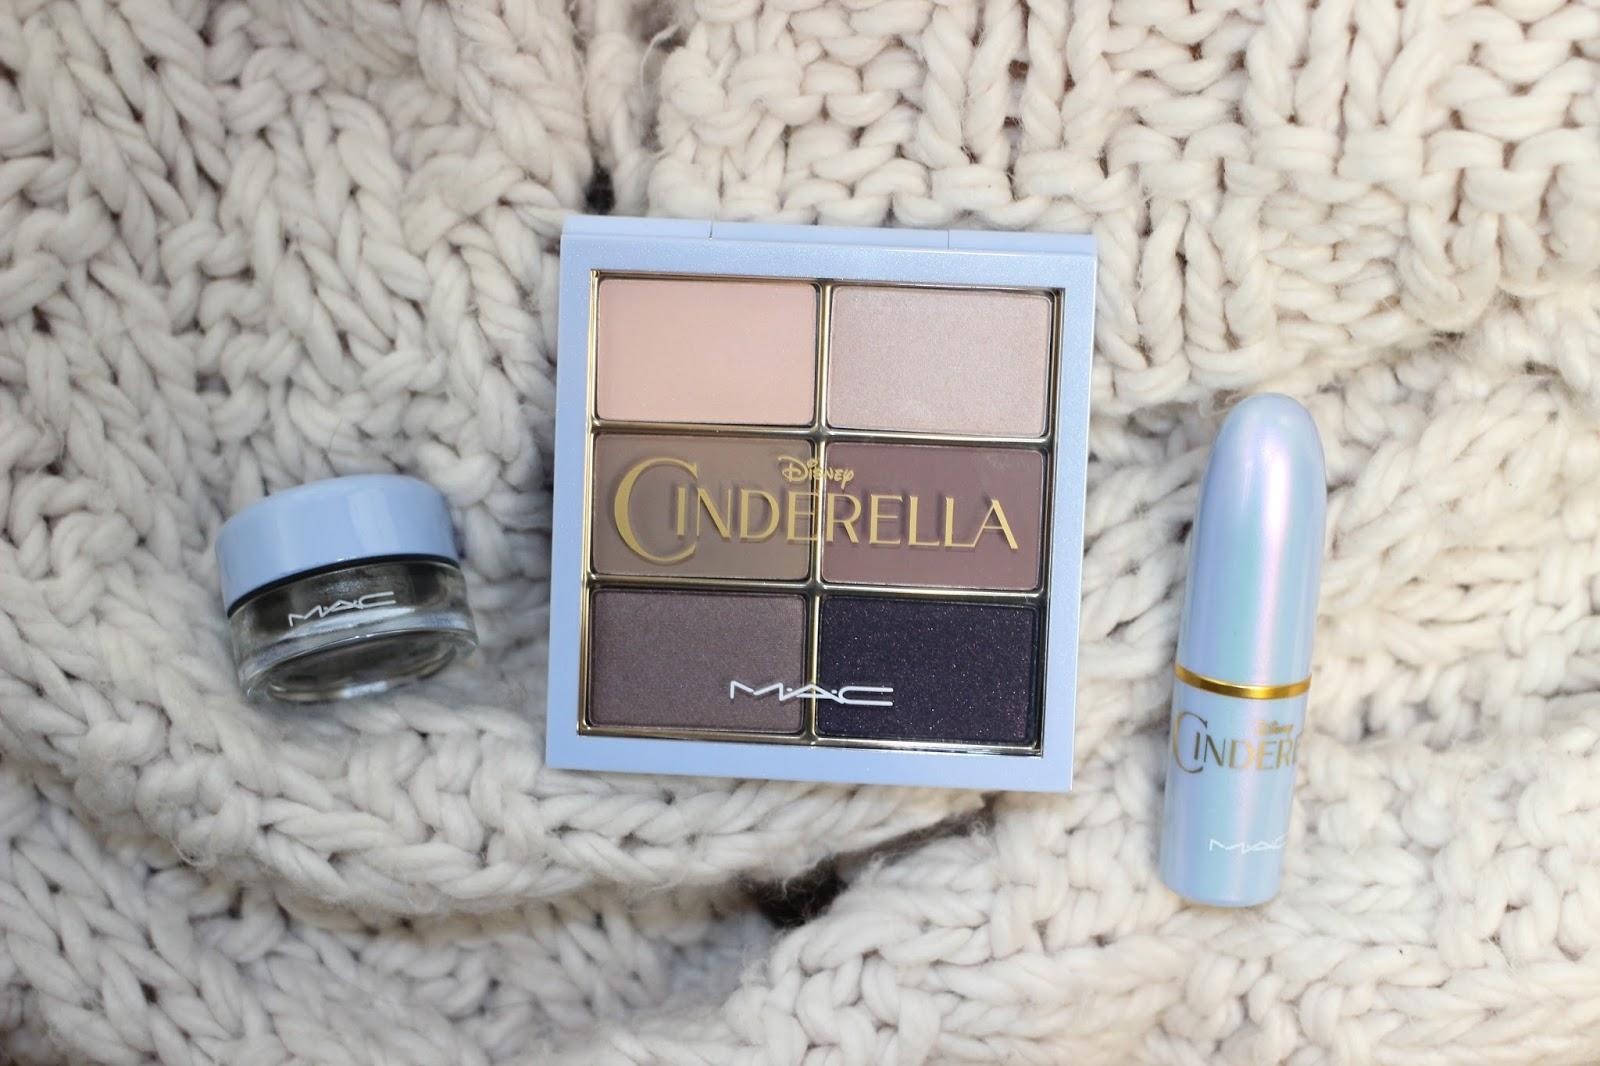 mac-cinderella-review